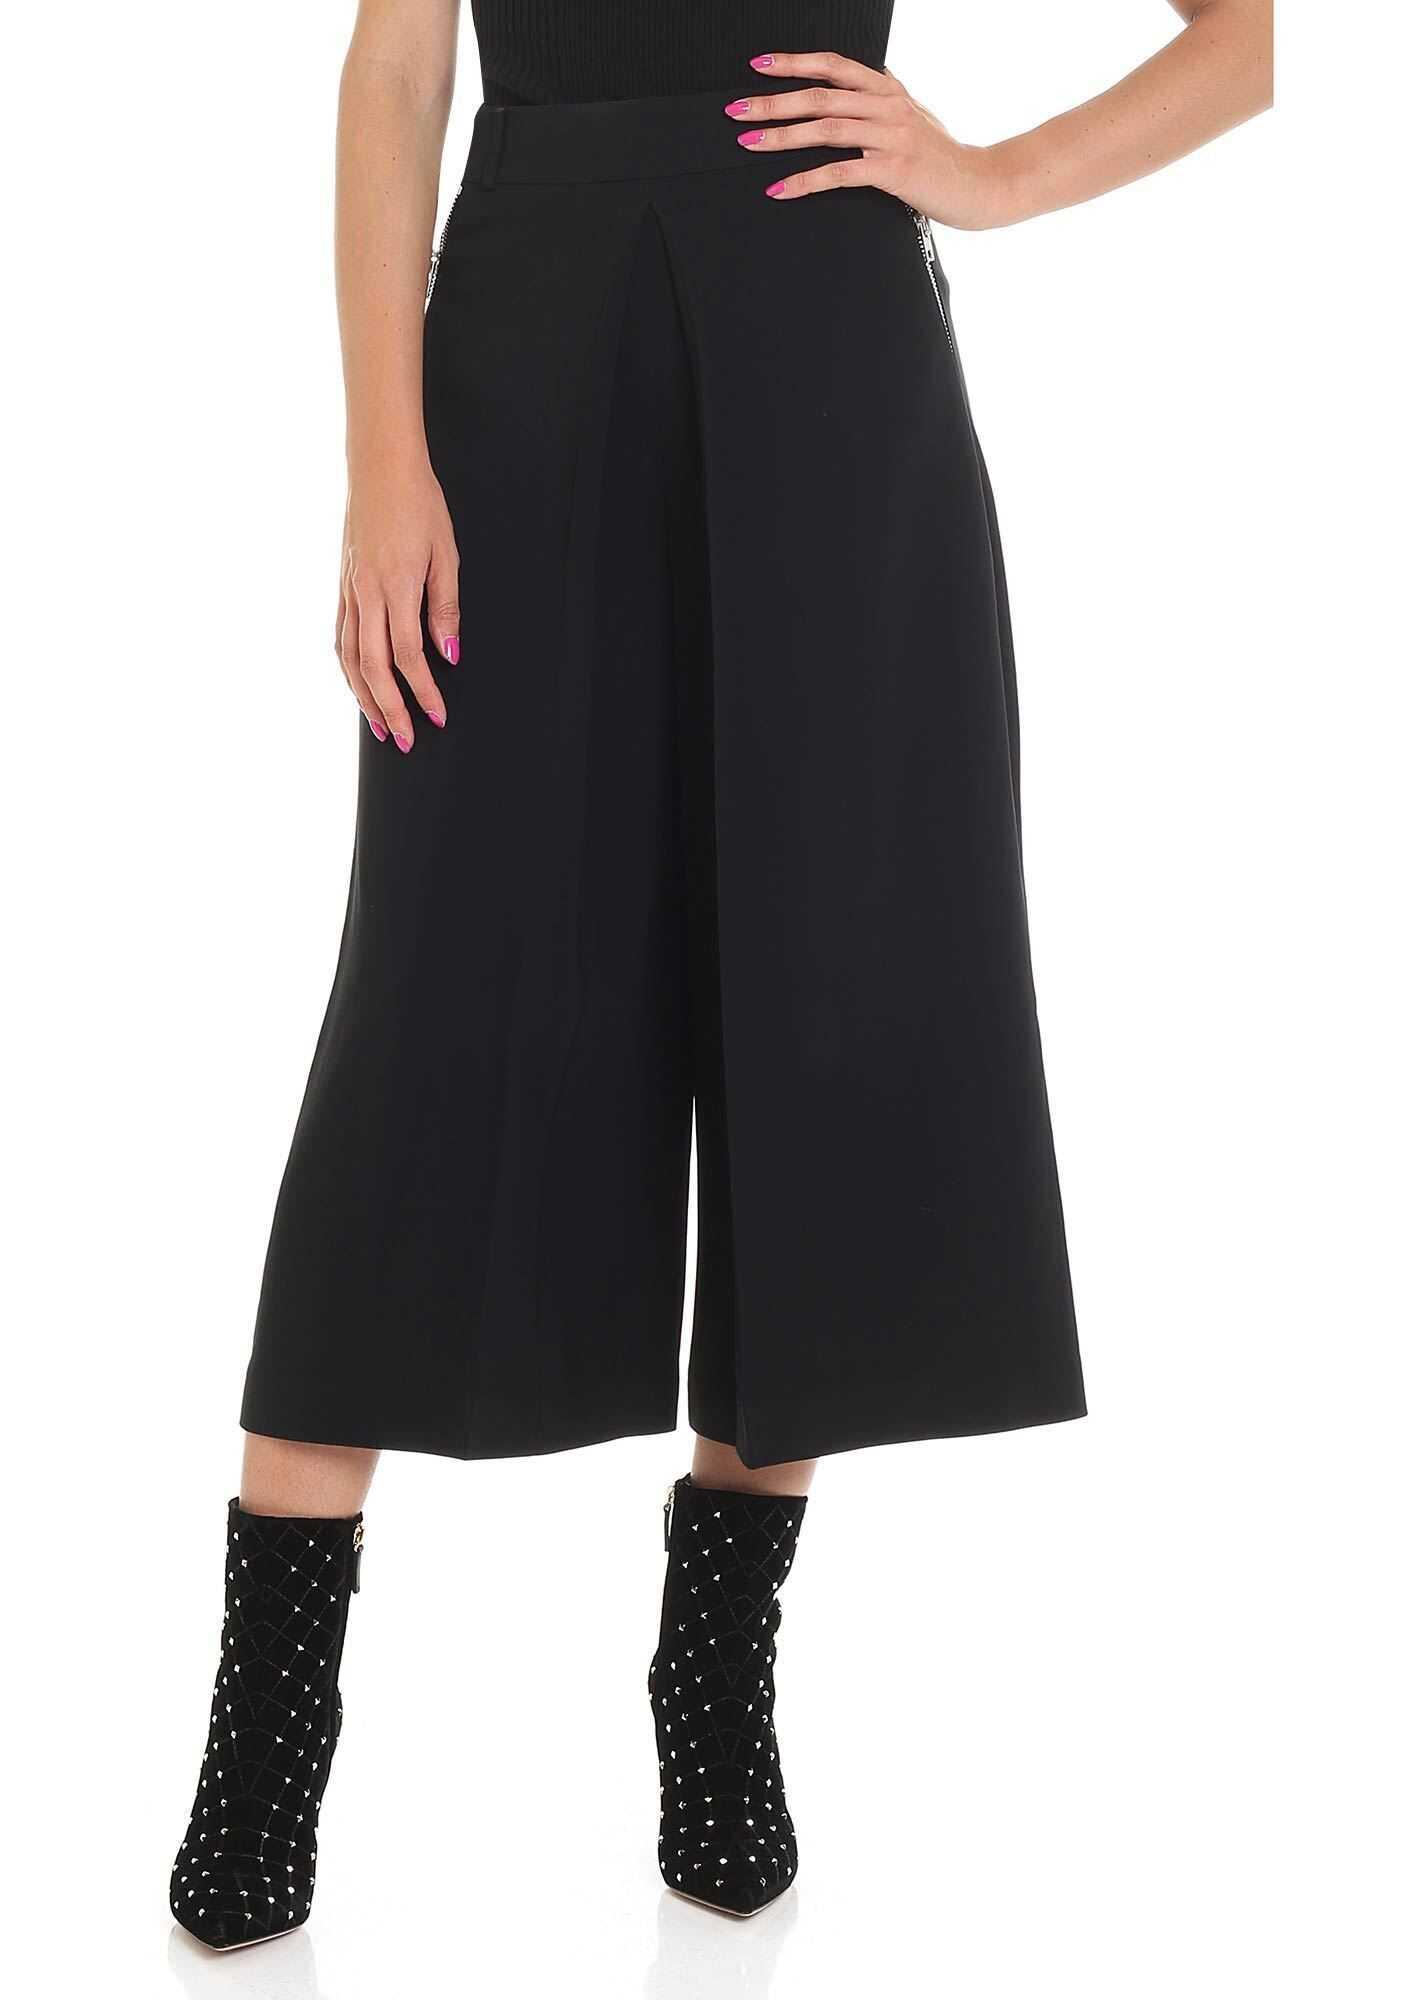 Alexander Wang Black Pants With Zip Black